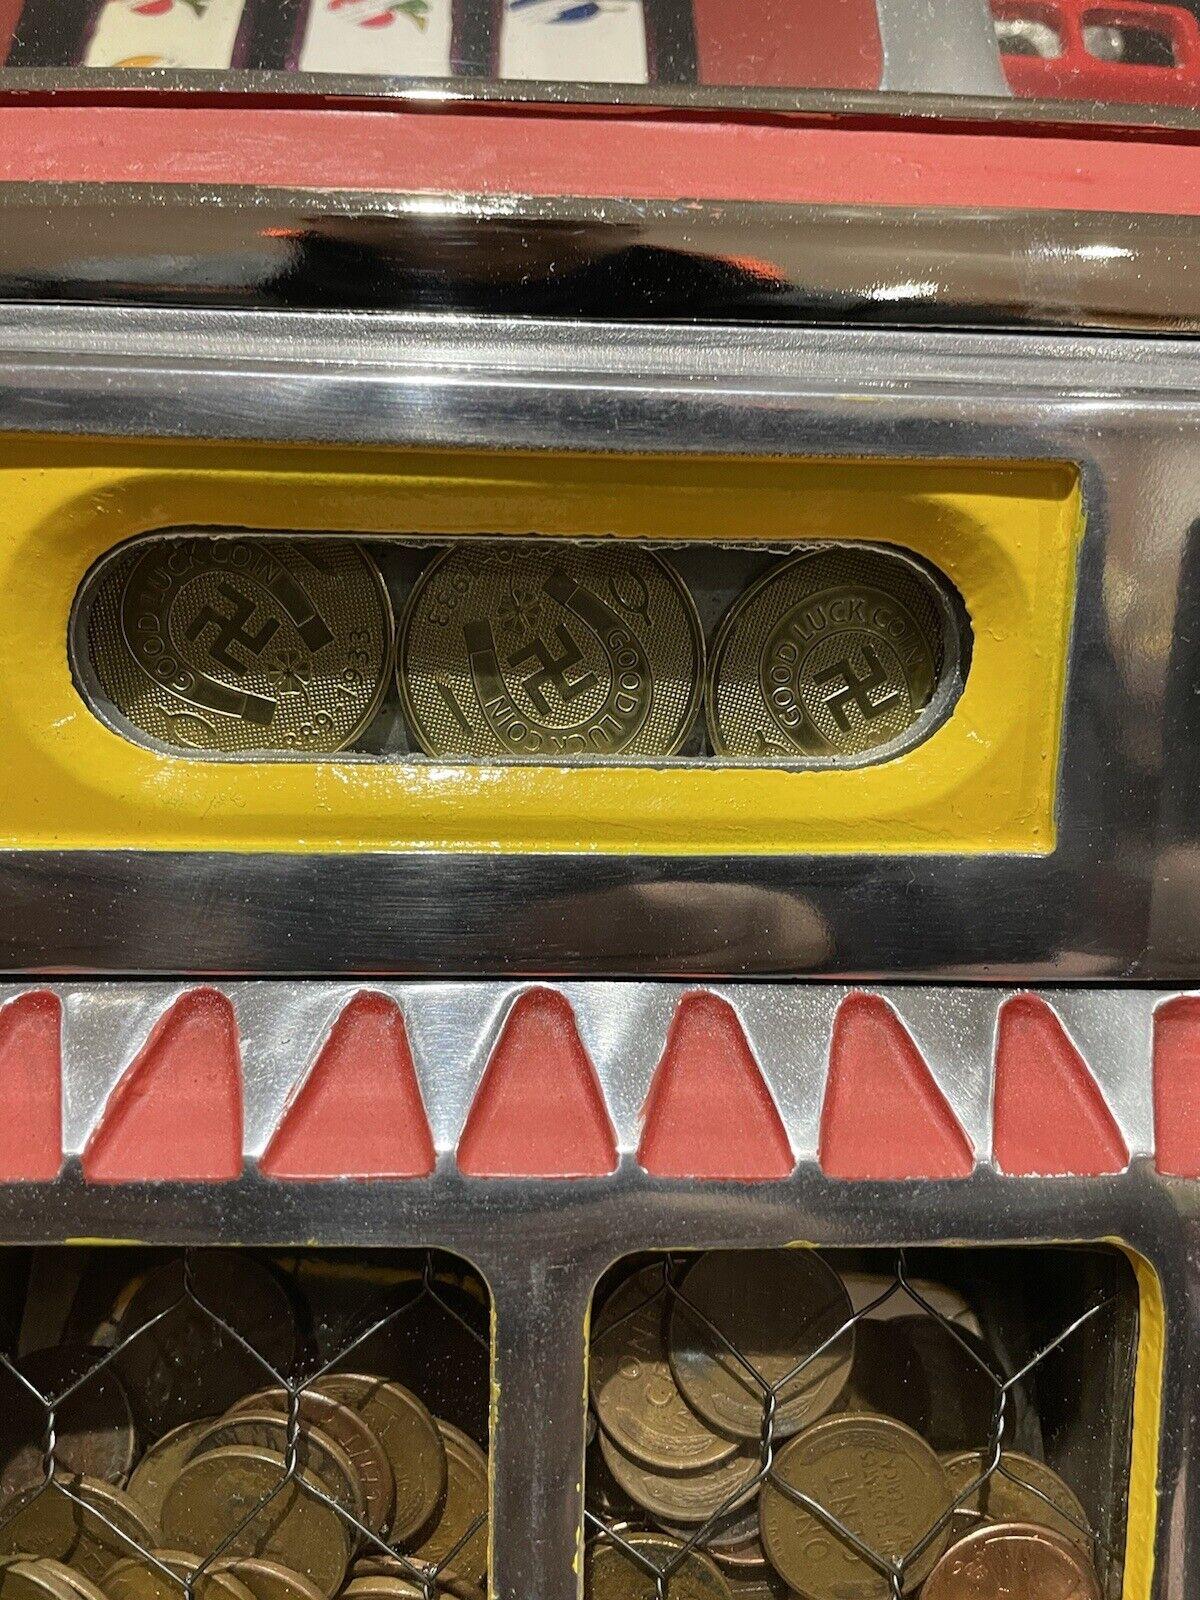 Watling Slot Machine Gold Award Tokens